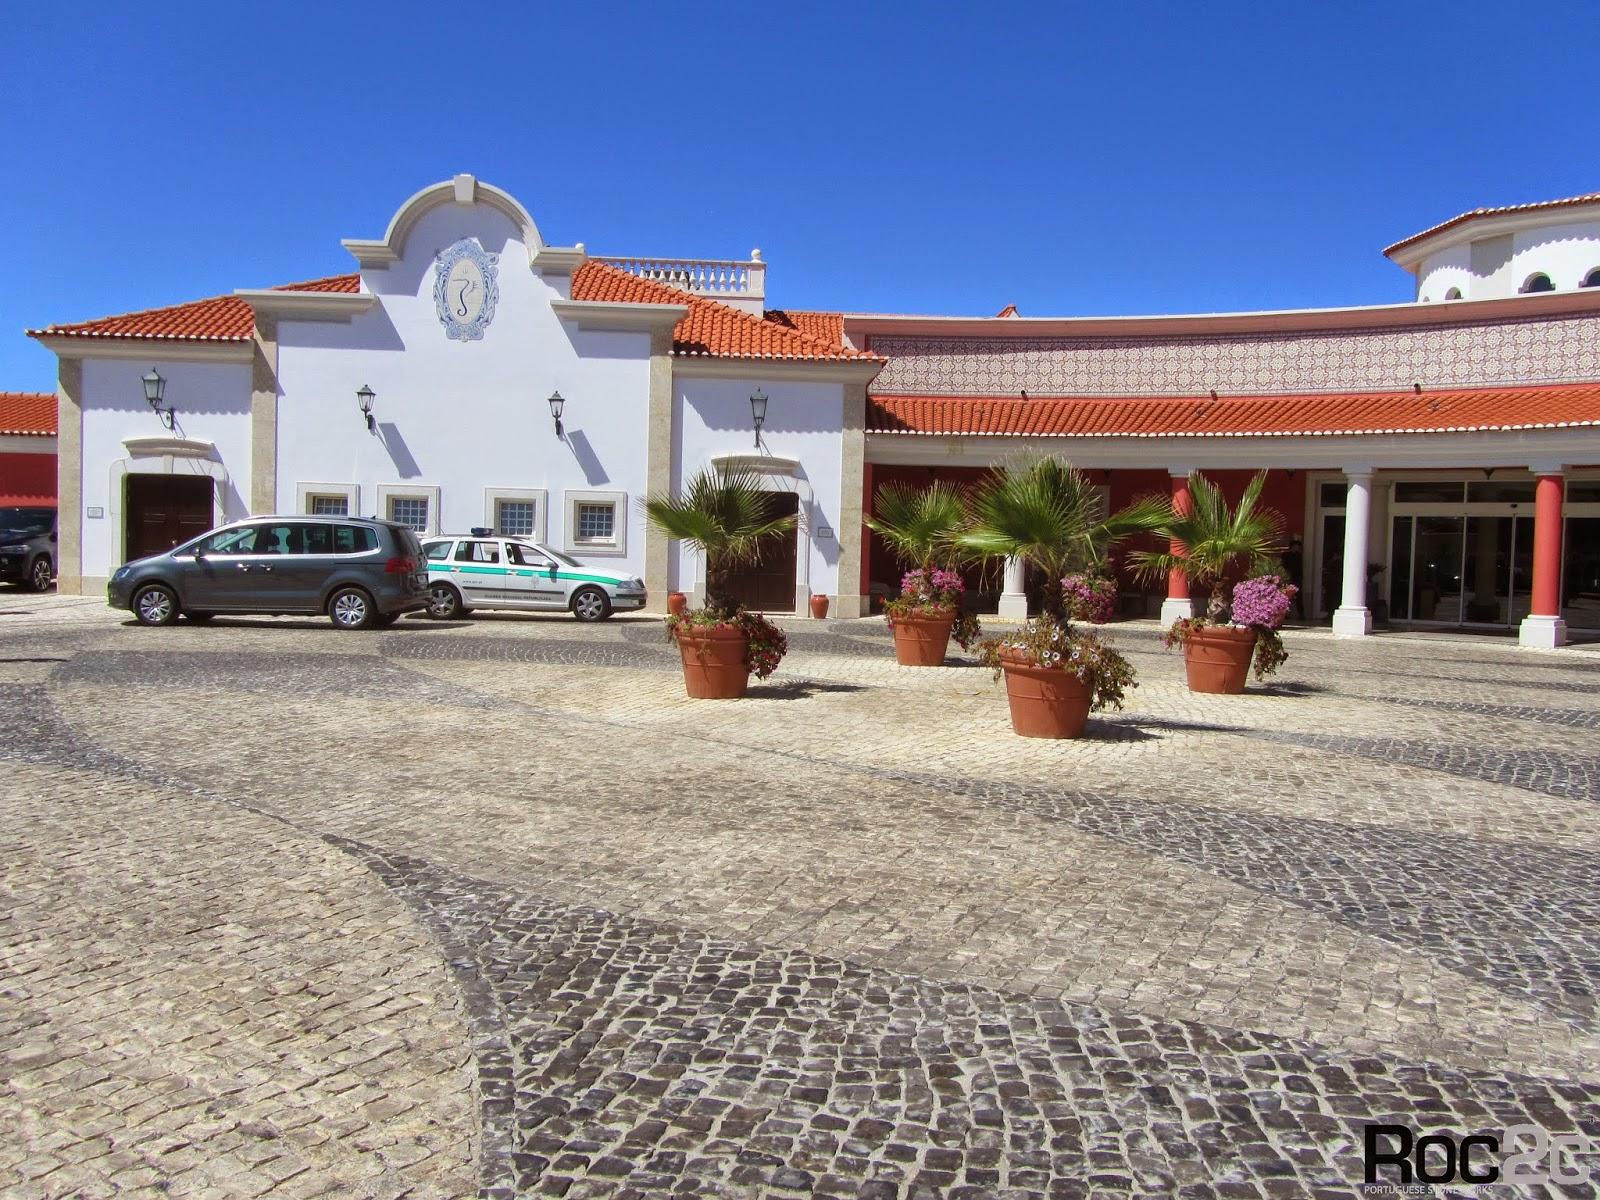 Avenida d in s de castro n 1 vale de janelas 2510 451 bidos leiria portugal